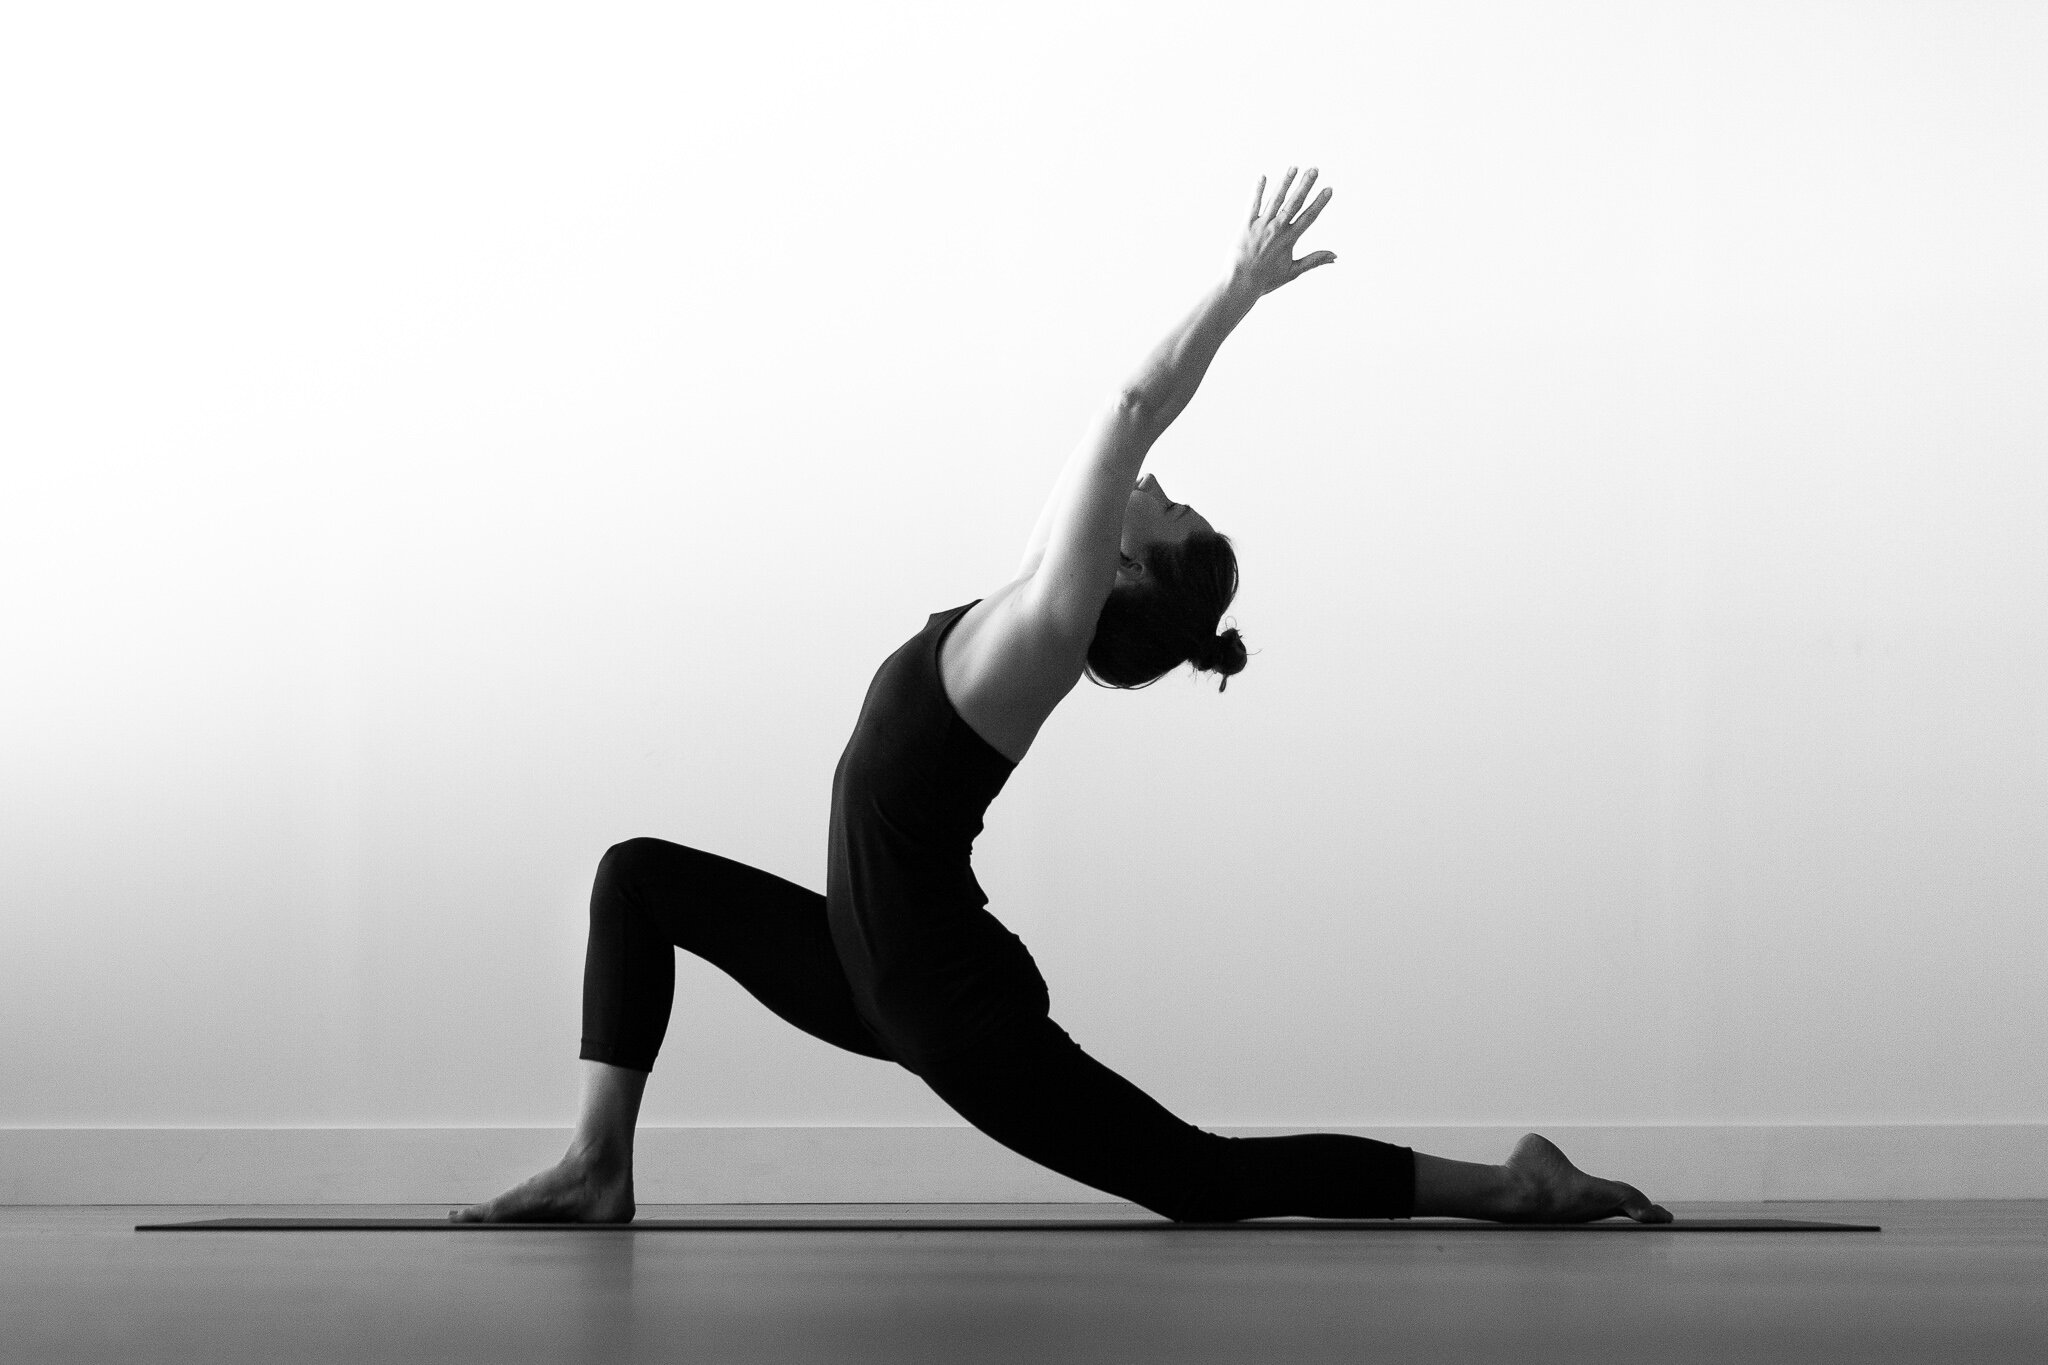 Susie_Hemsted_Yoga_Challenge_September_2020_Online_Beginners_Yoga_London